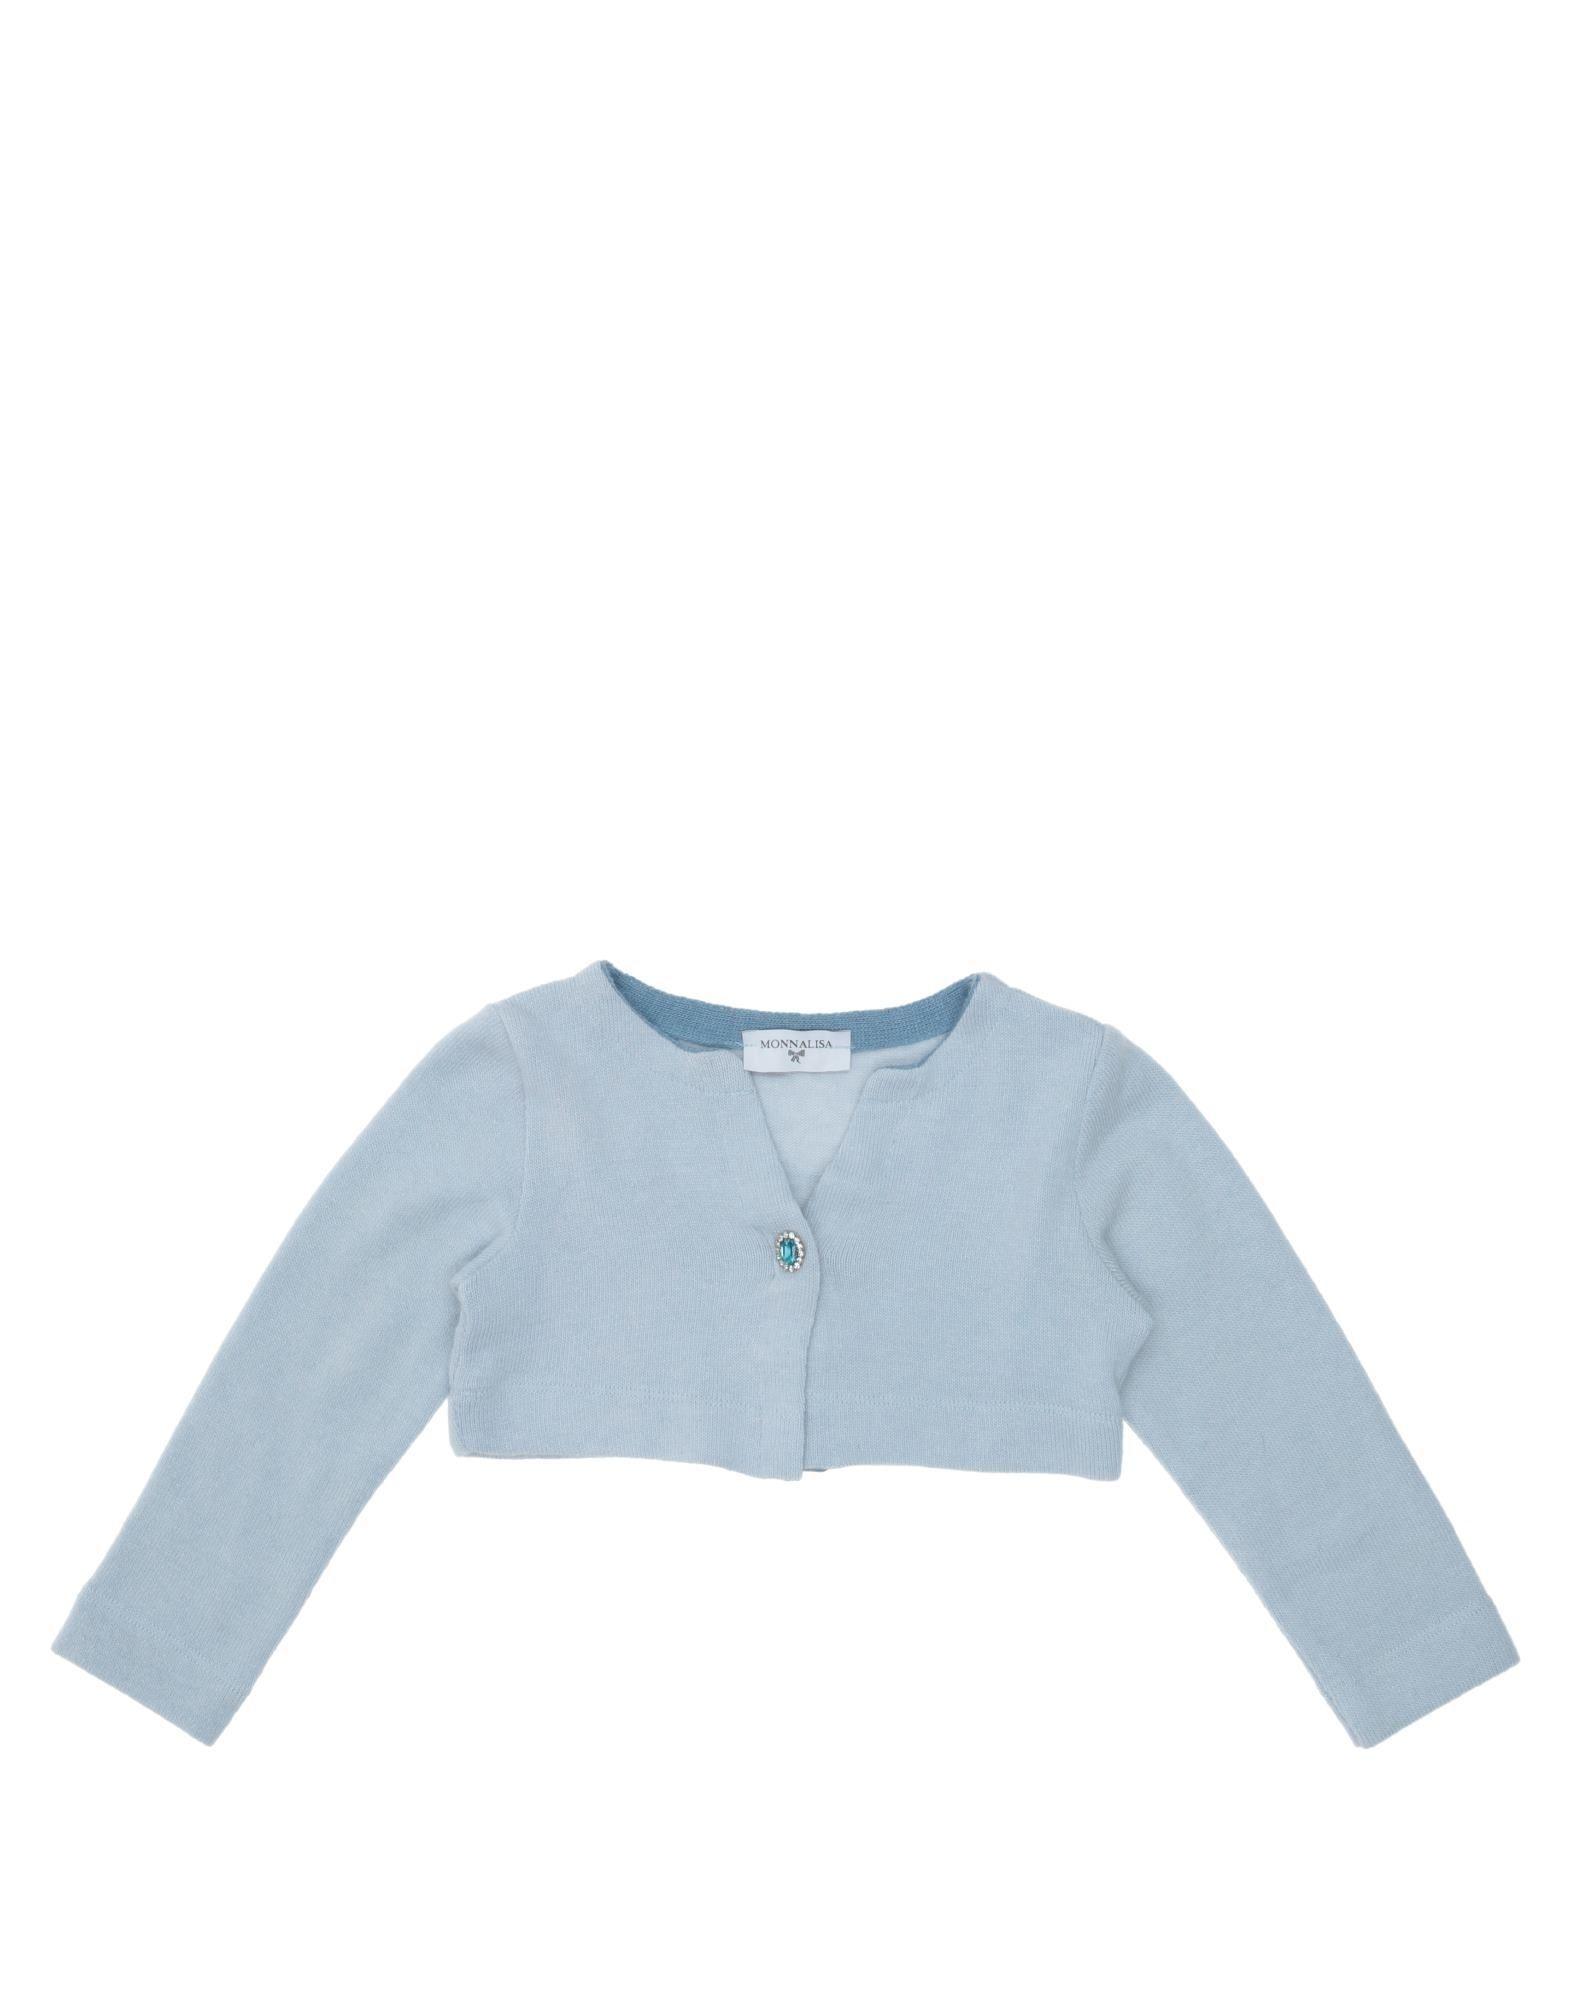 KNITWEAR Monnalisa Sky blue Girl Cotton